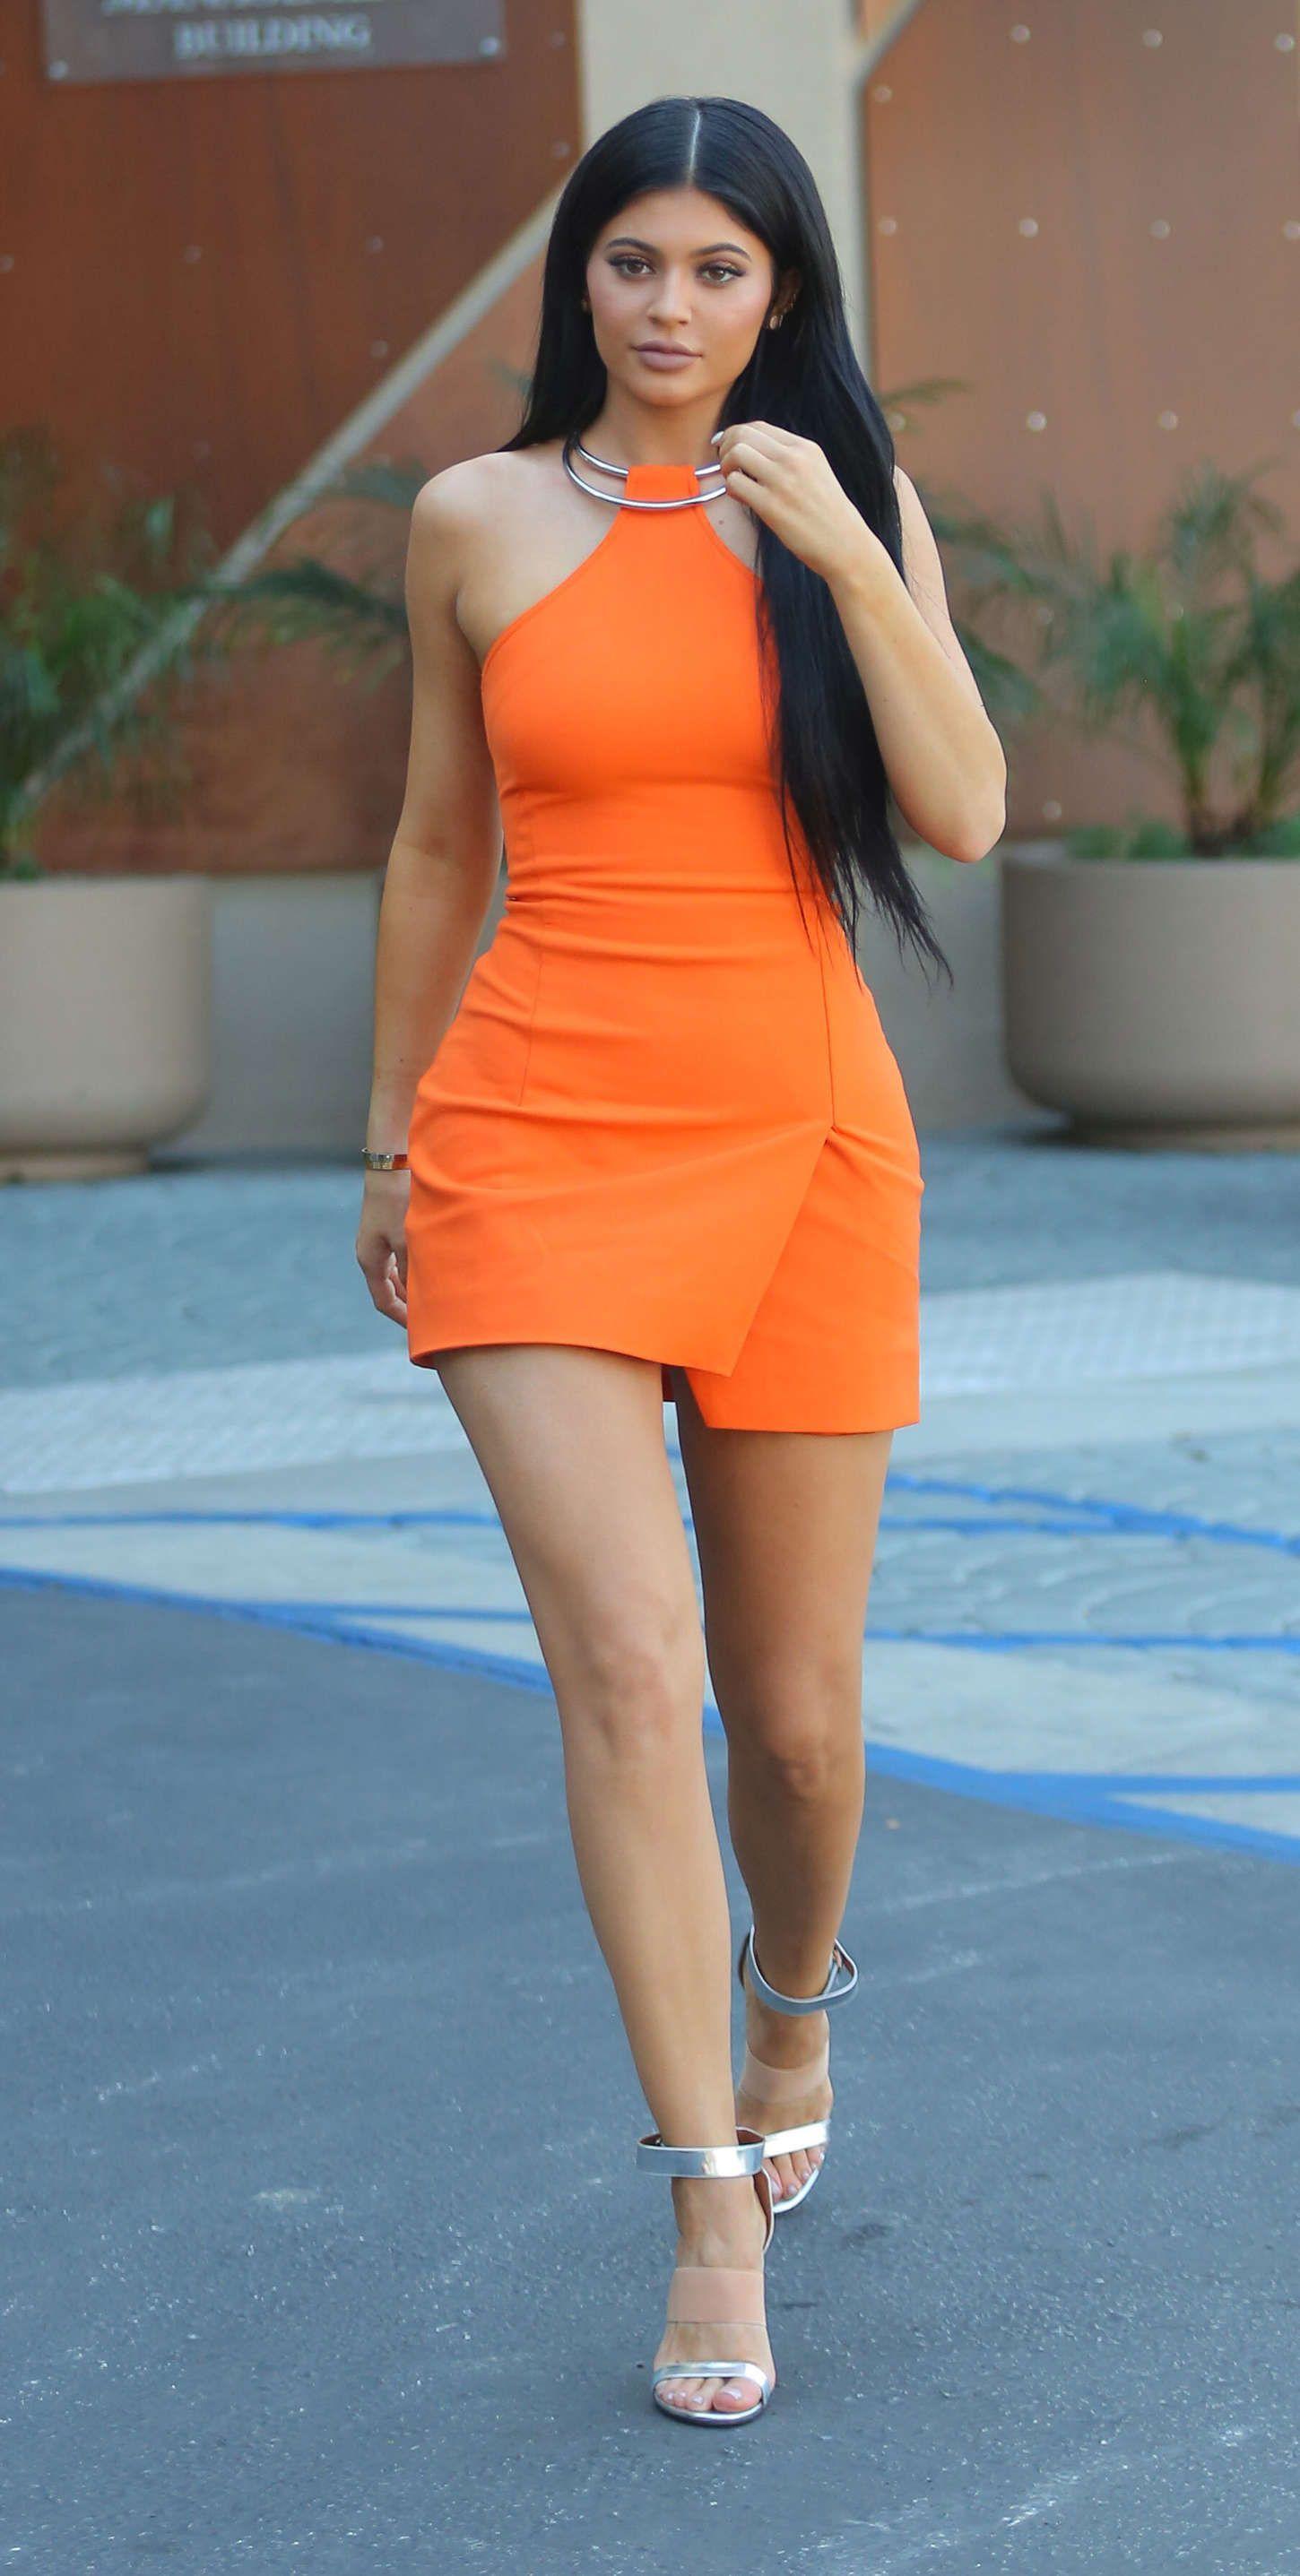 Kylie jenner aux longues jambes en robe orange dans la for Kylie jenner robe